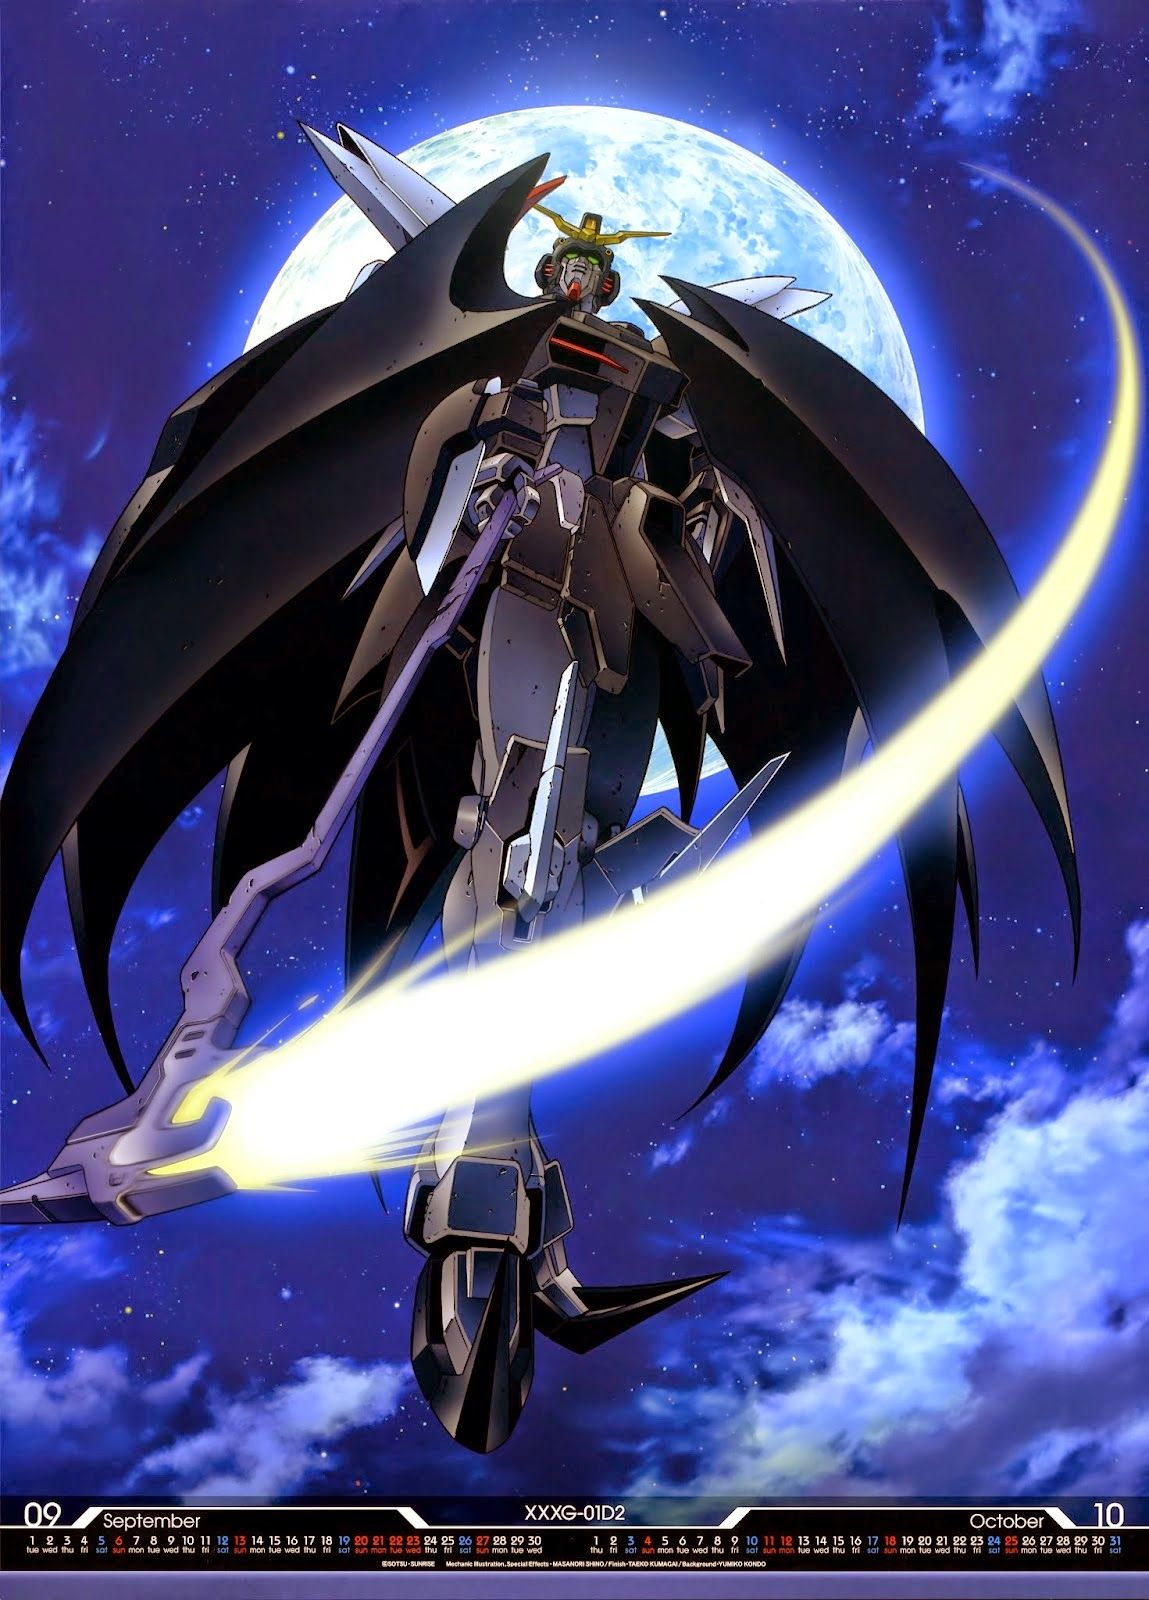 Mobile Suit Gundam Series 2015 Calender Cover Image